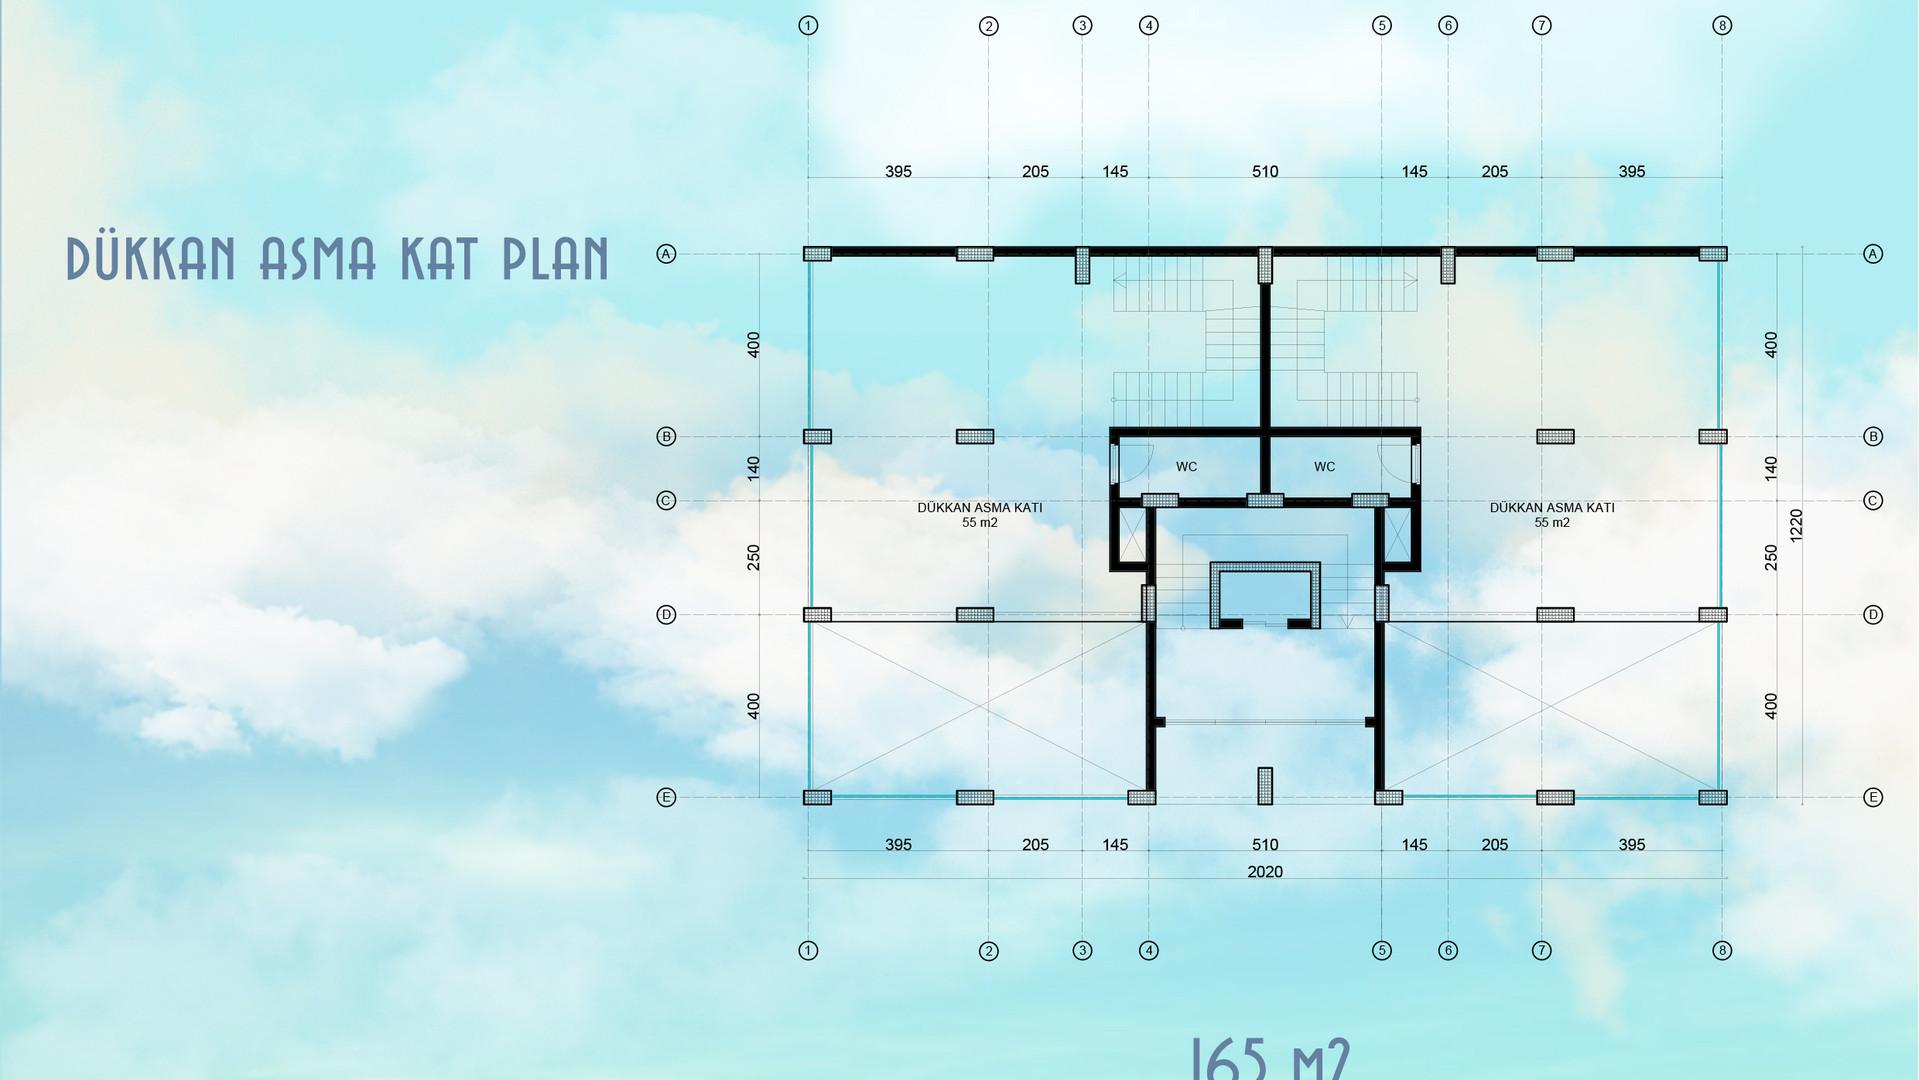 Normal Kat Planı